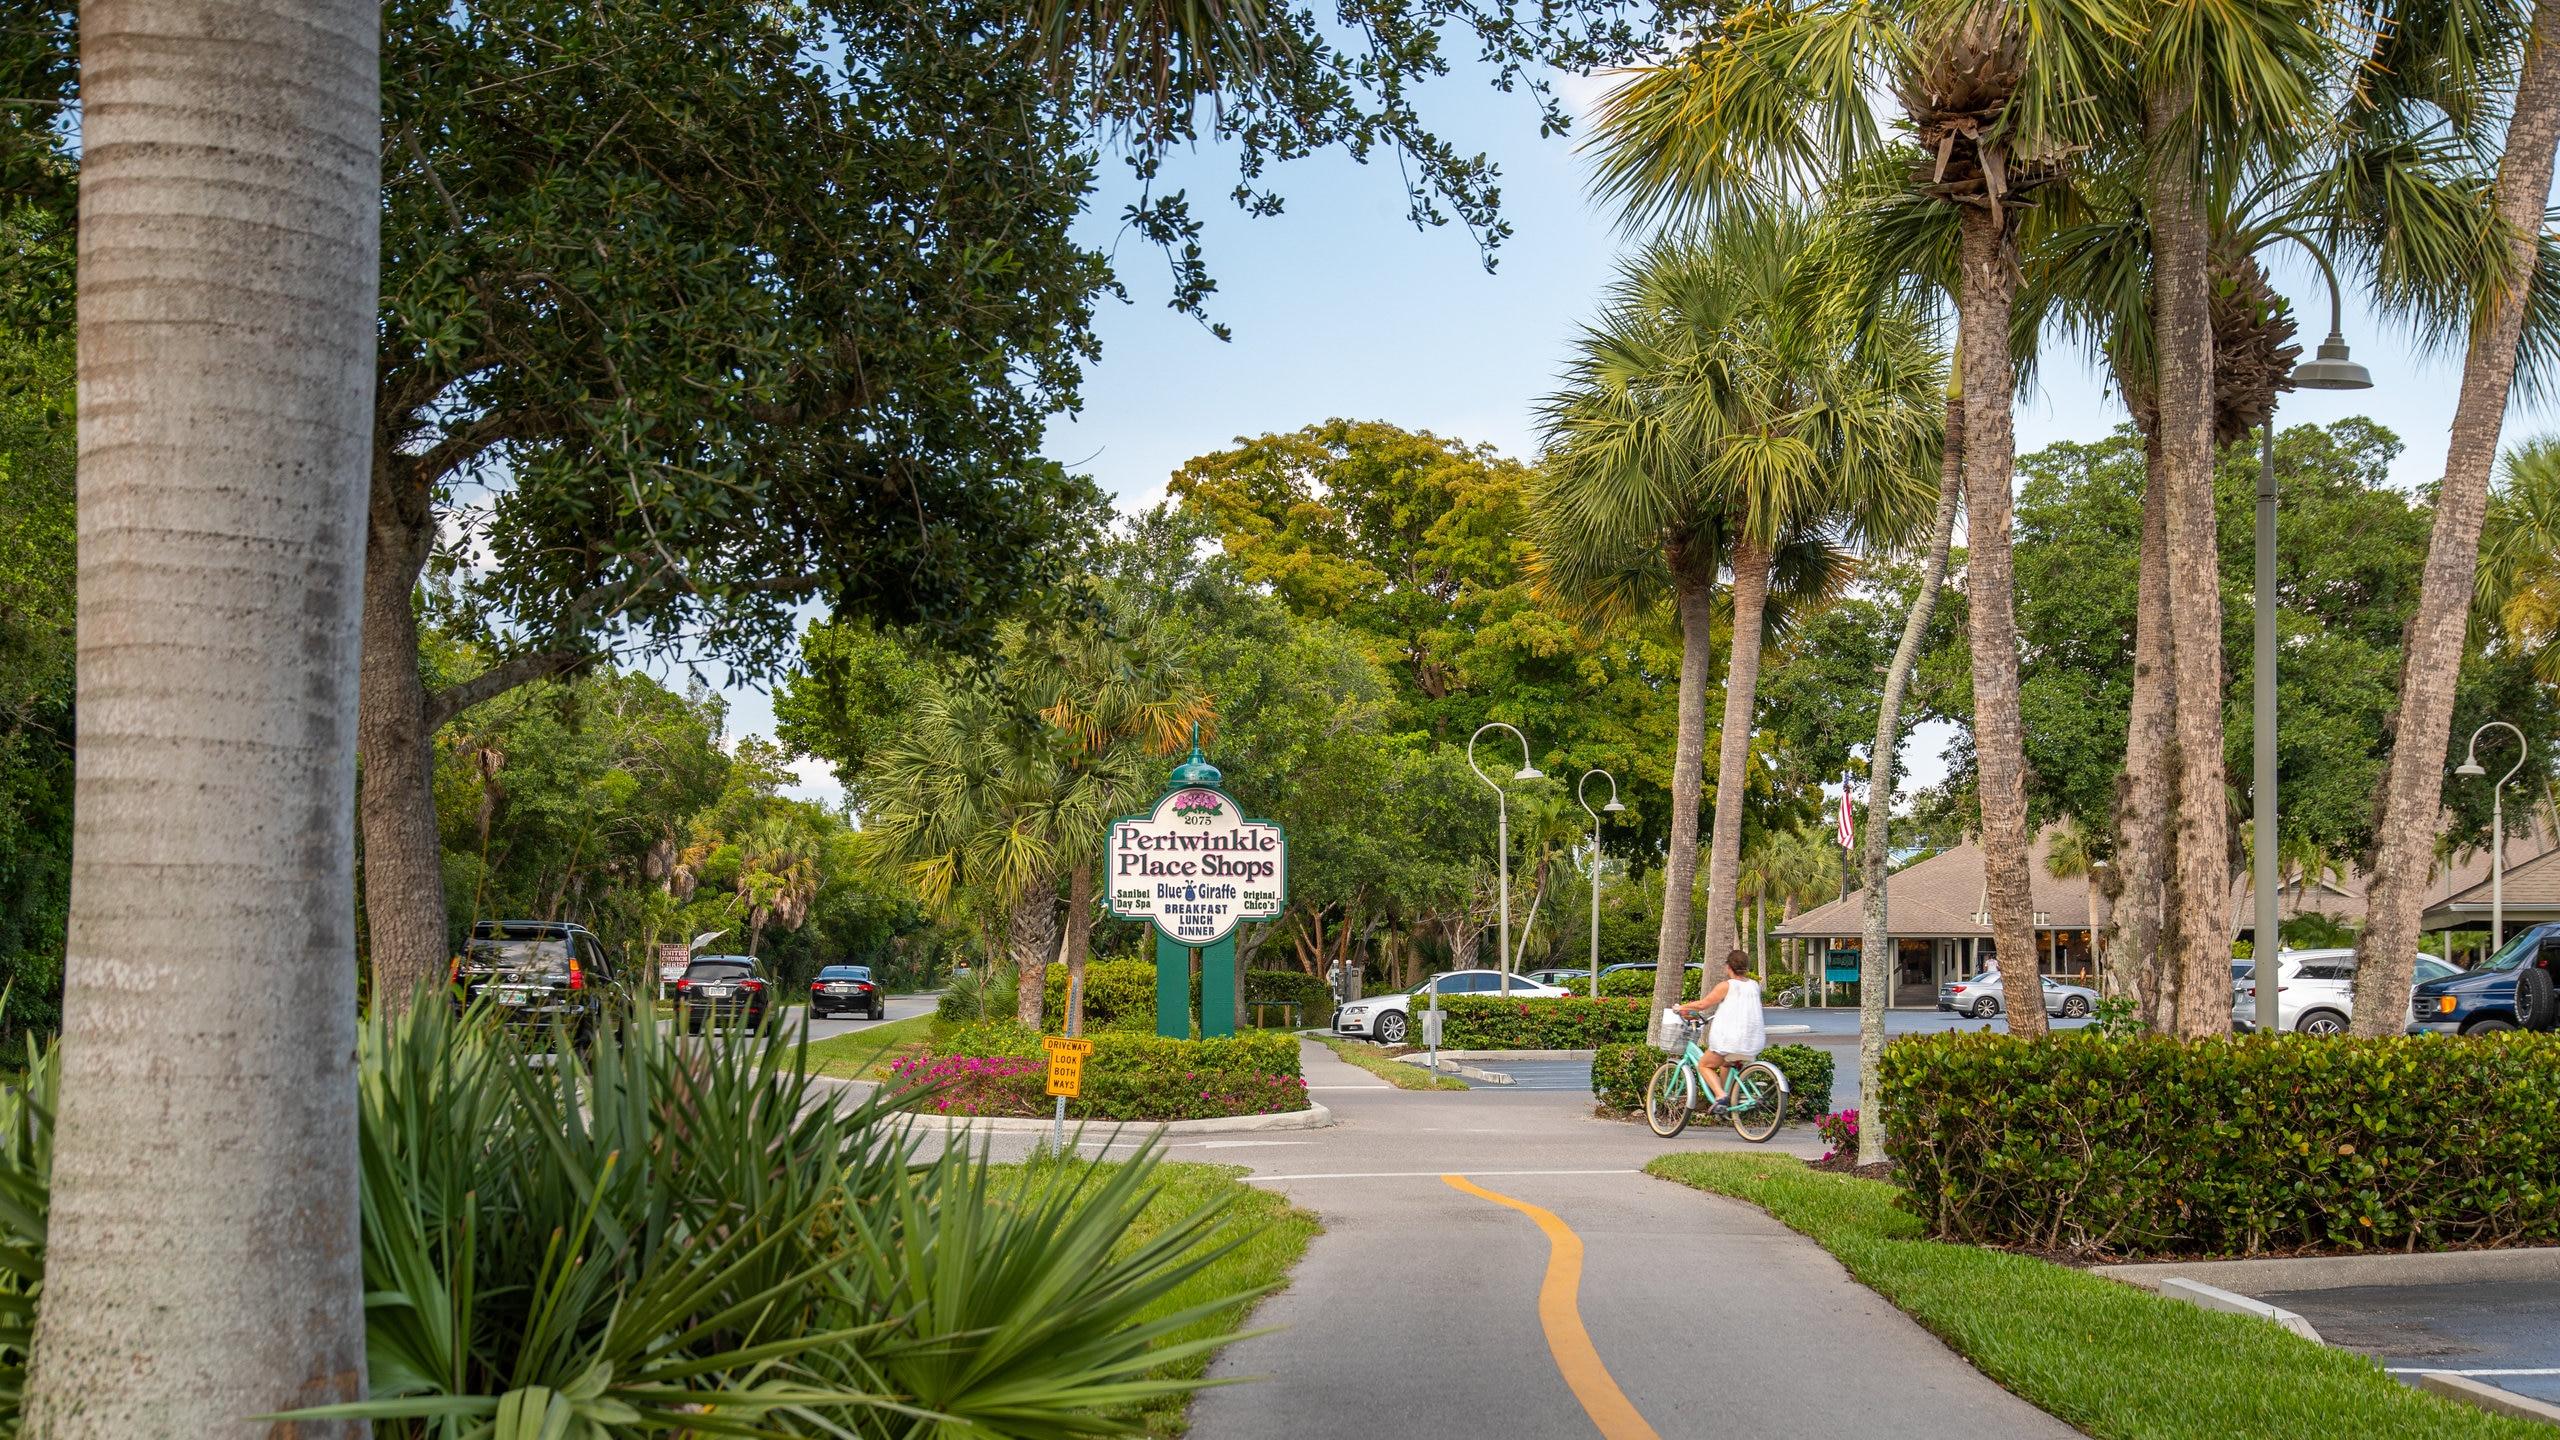 Periwinkle Way, Sanibel, Florida, United States of America